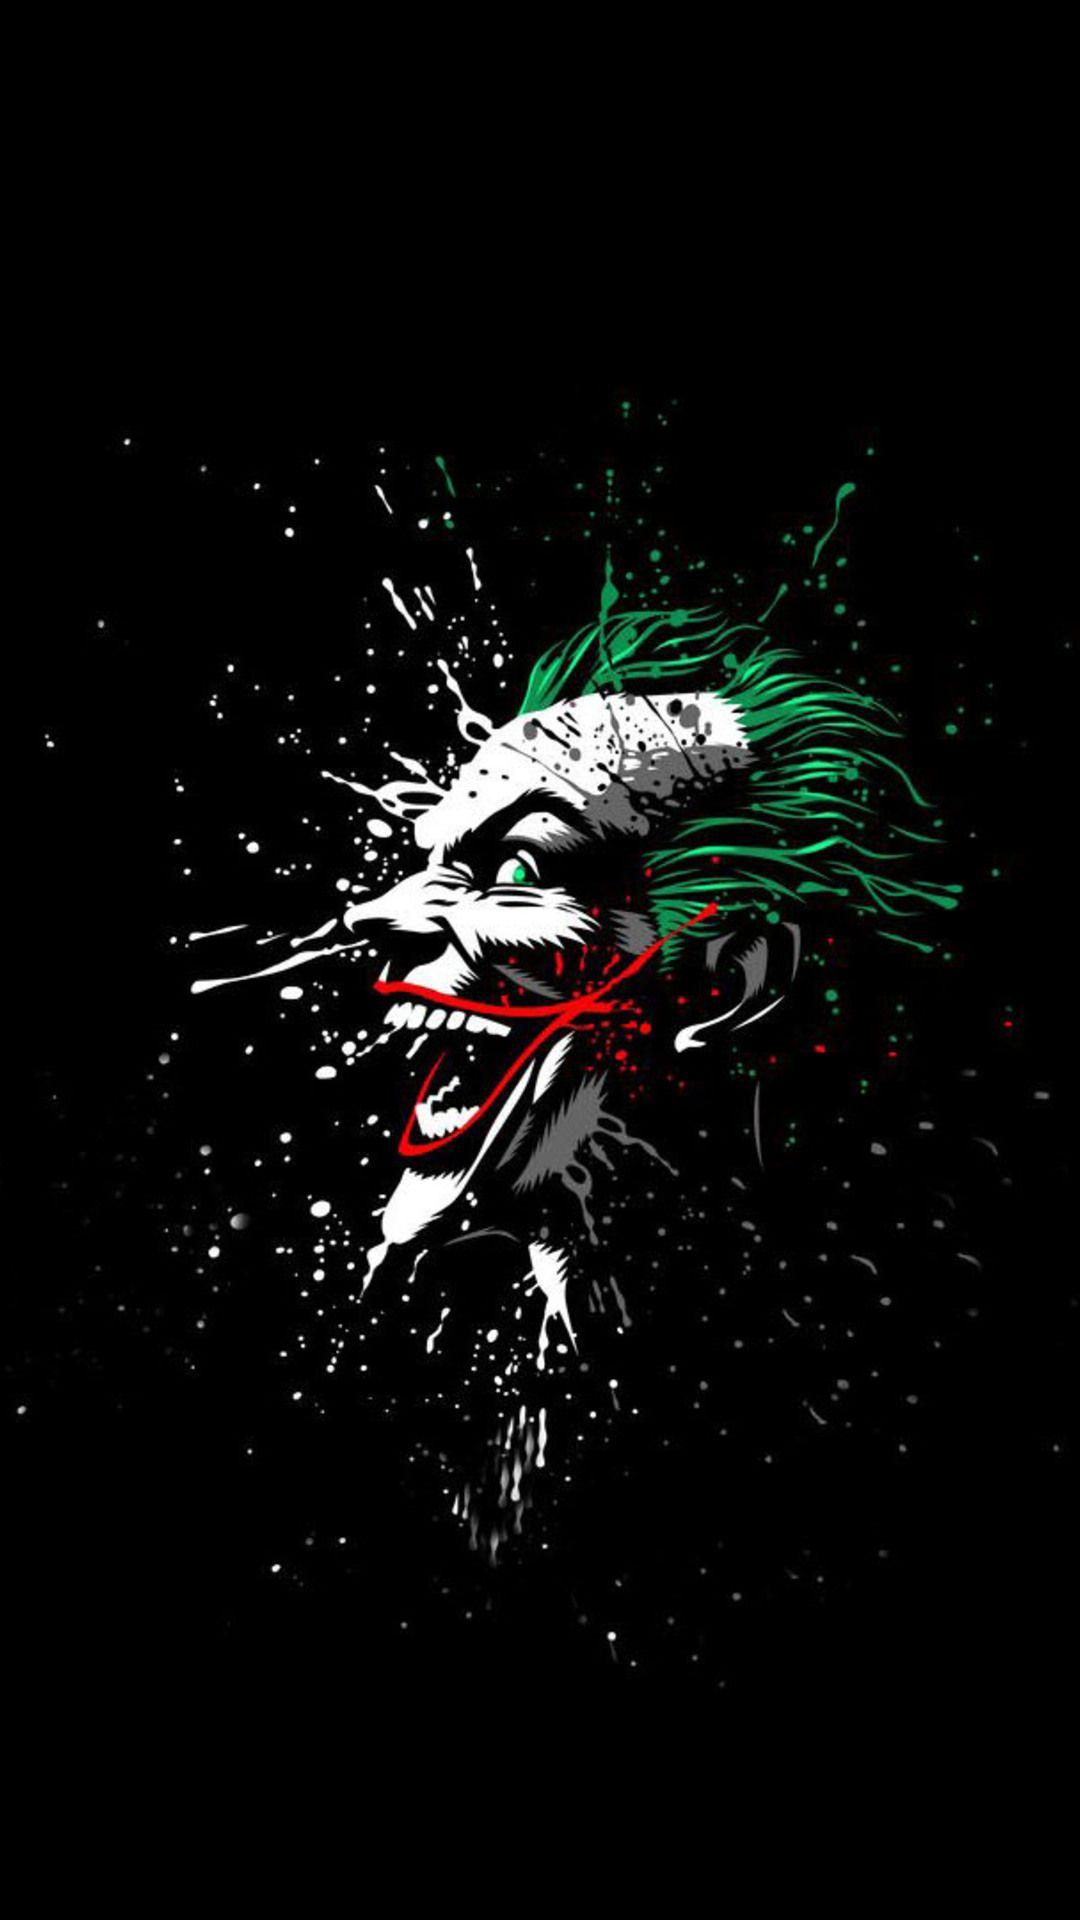 Free Download Joker Iphone Wallpaper Download Joker Artwork Joker Hd 1080x1920 For Your Desktop Mobile Tablet Explore 31 Batman 2020 Wallpapers Batman 2020 Wallpapers Batman Backgrounds Batman Wallpaper